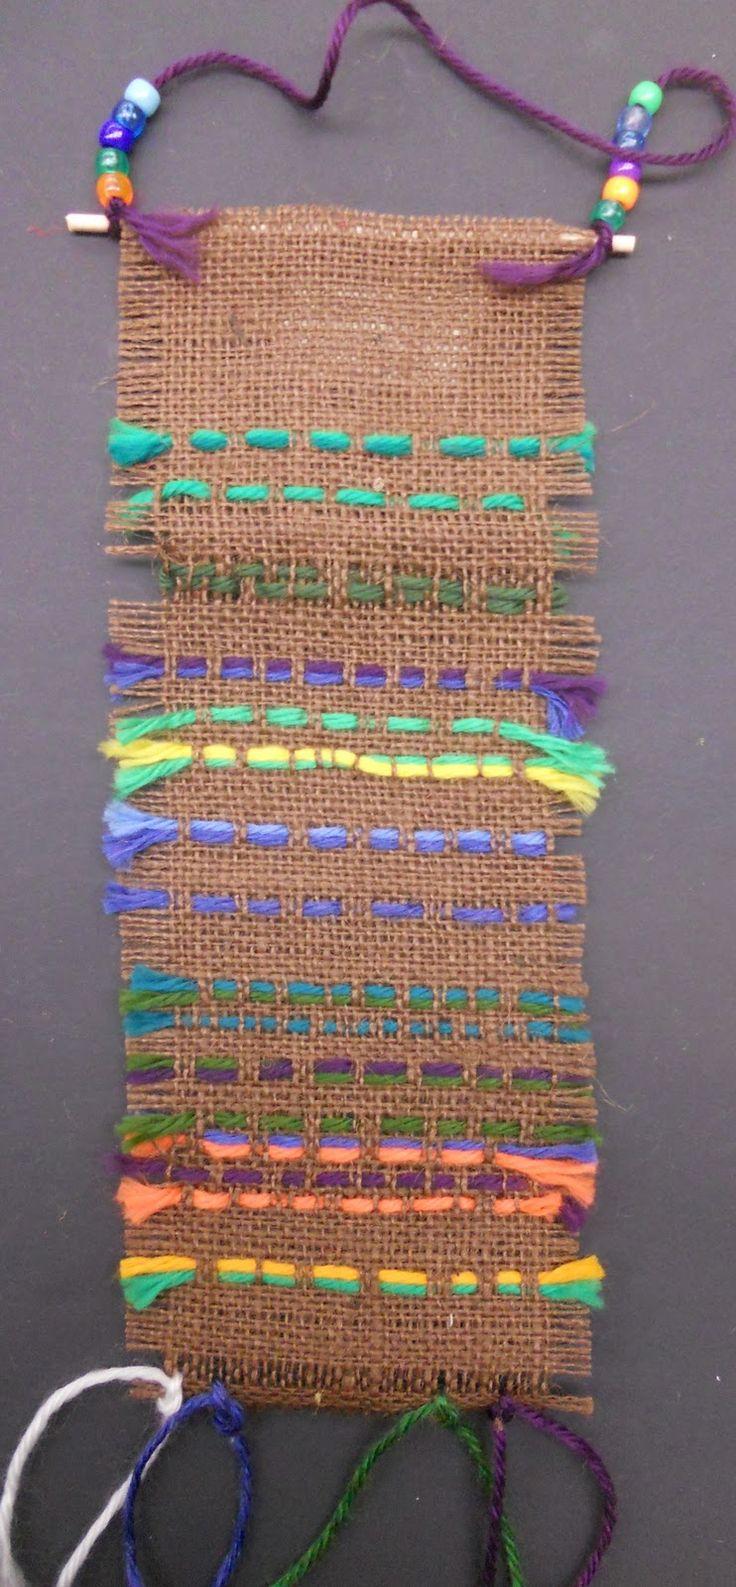 3rd grade burlap weaving | Panther's Palette: 3rd Grade: Burlap Weavings